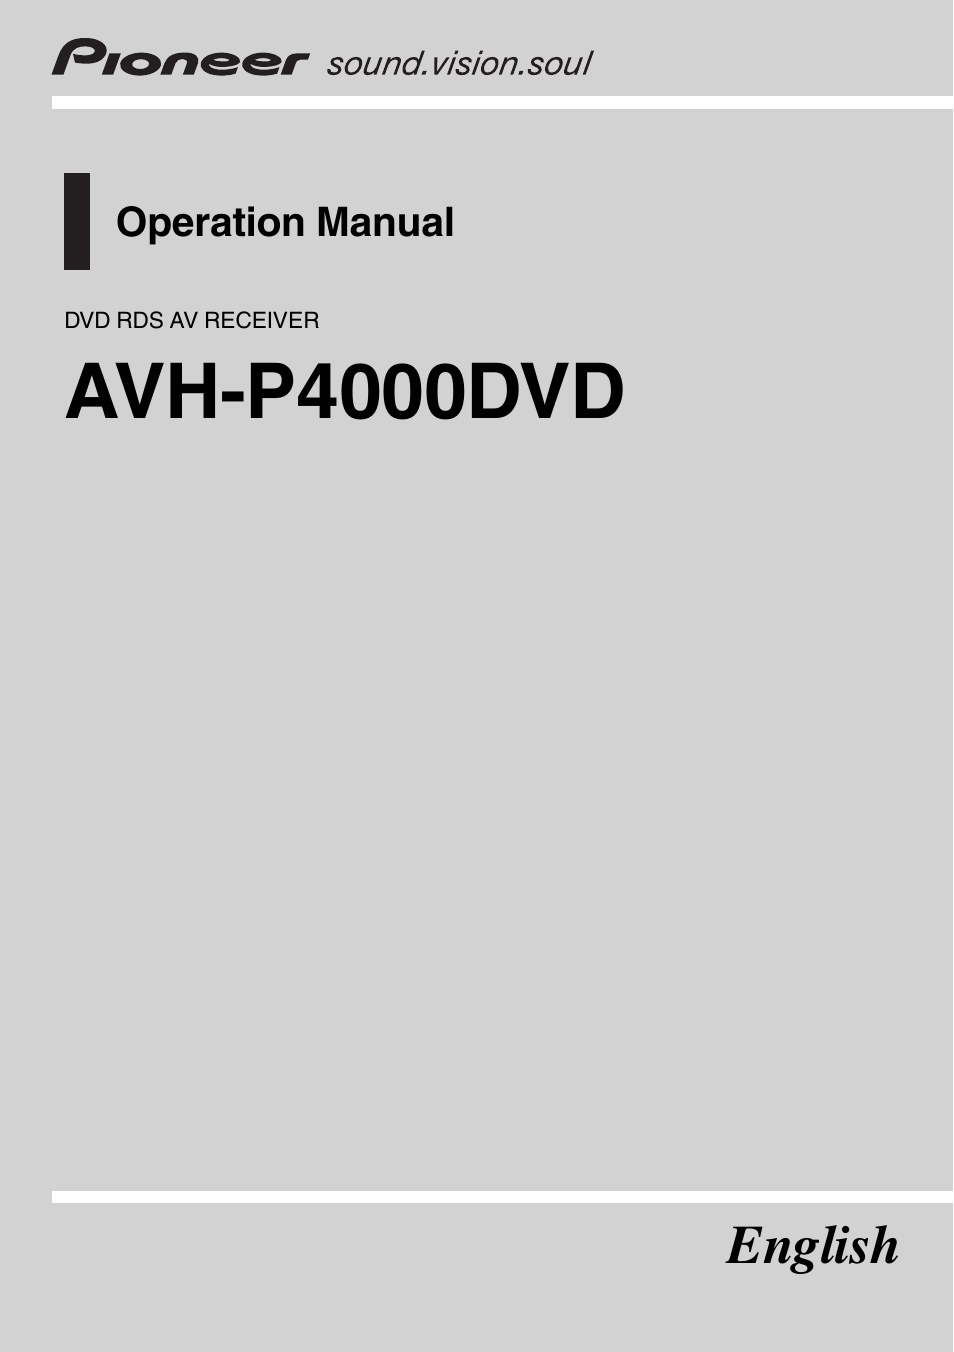 Wiring Diagram For Pioneer Avh P4000dvd Enthusiast Diagrams P3200bt User Manual 96 Pages Rh Manualsdir Com